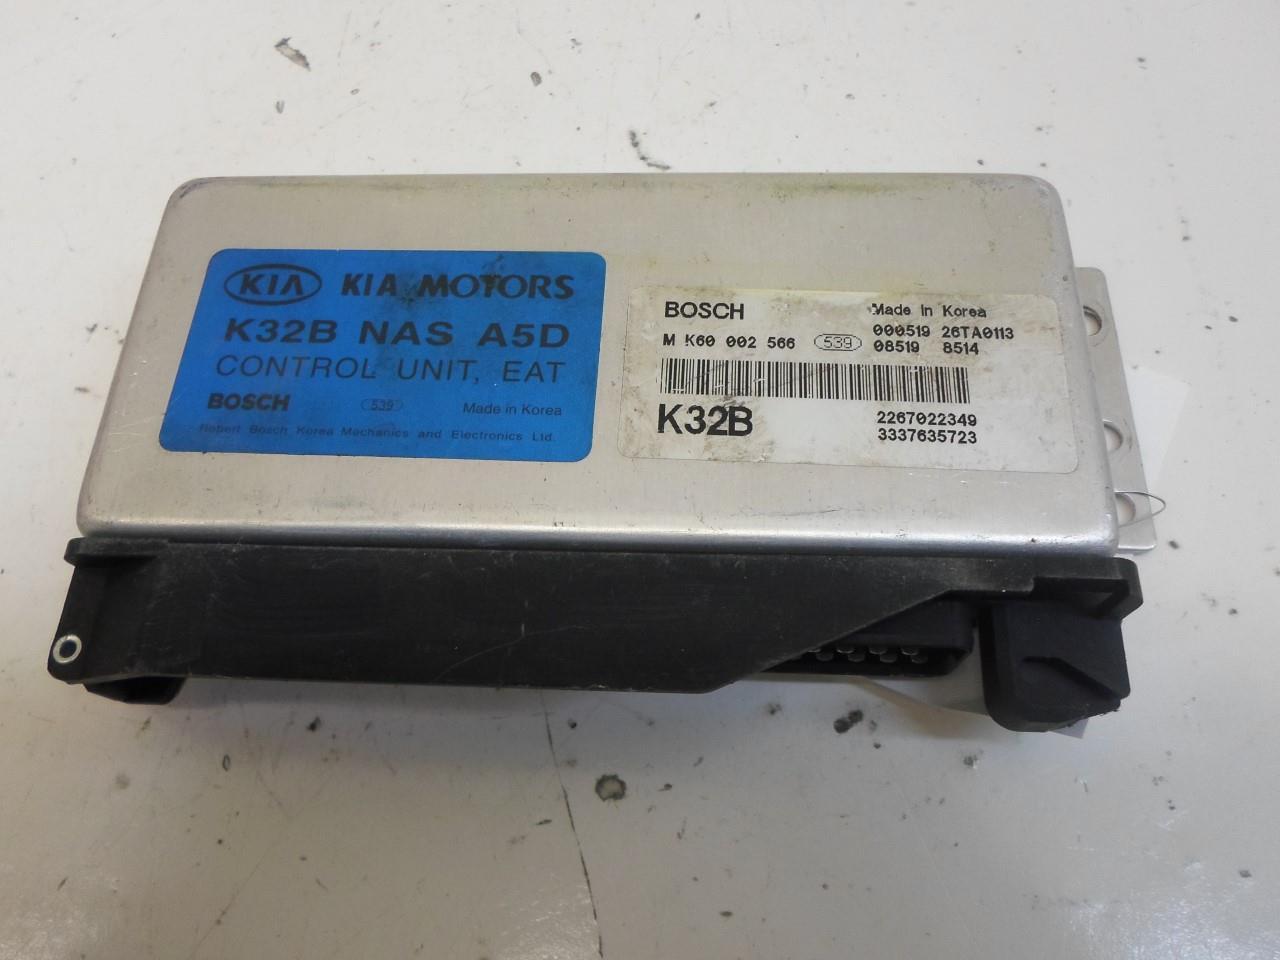 2000-2002 Kia Rio TCM transmission computer K32B 18 9E0